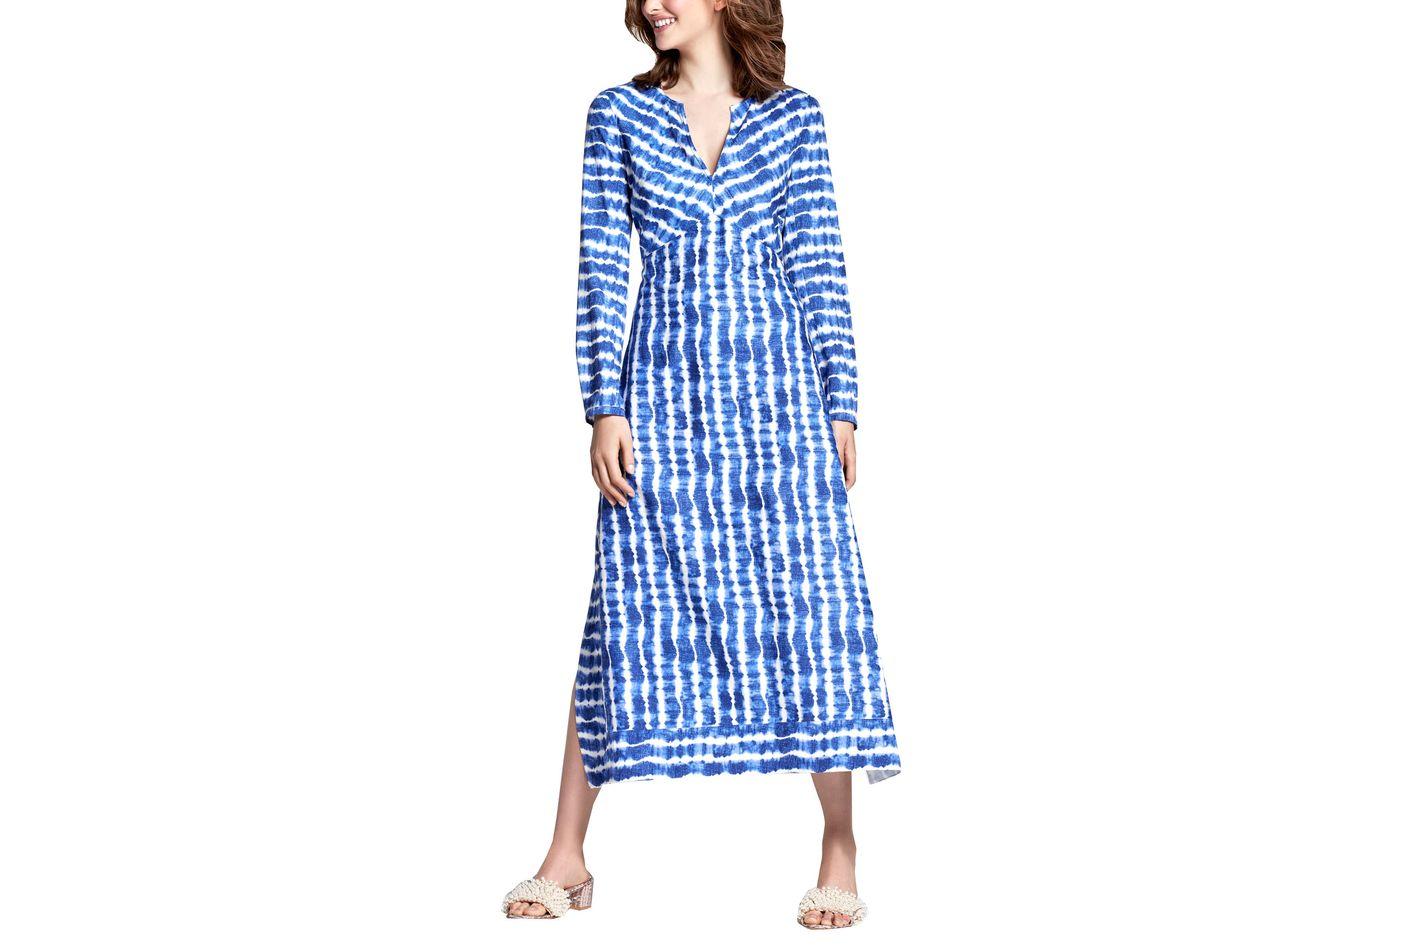 Tory Burch Long-Sleeve Tie-Dye Maxi Dress